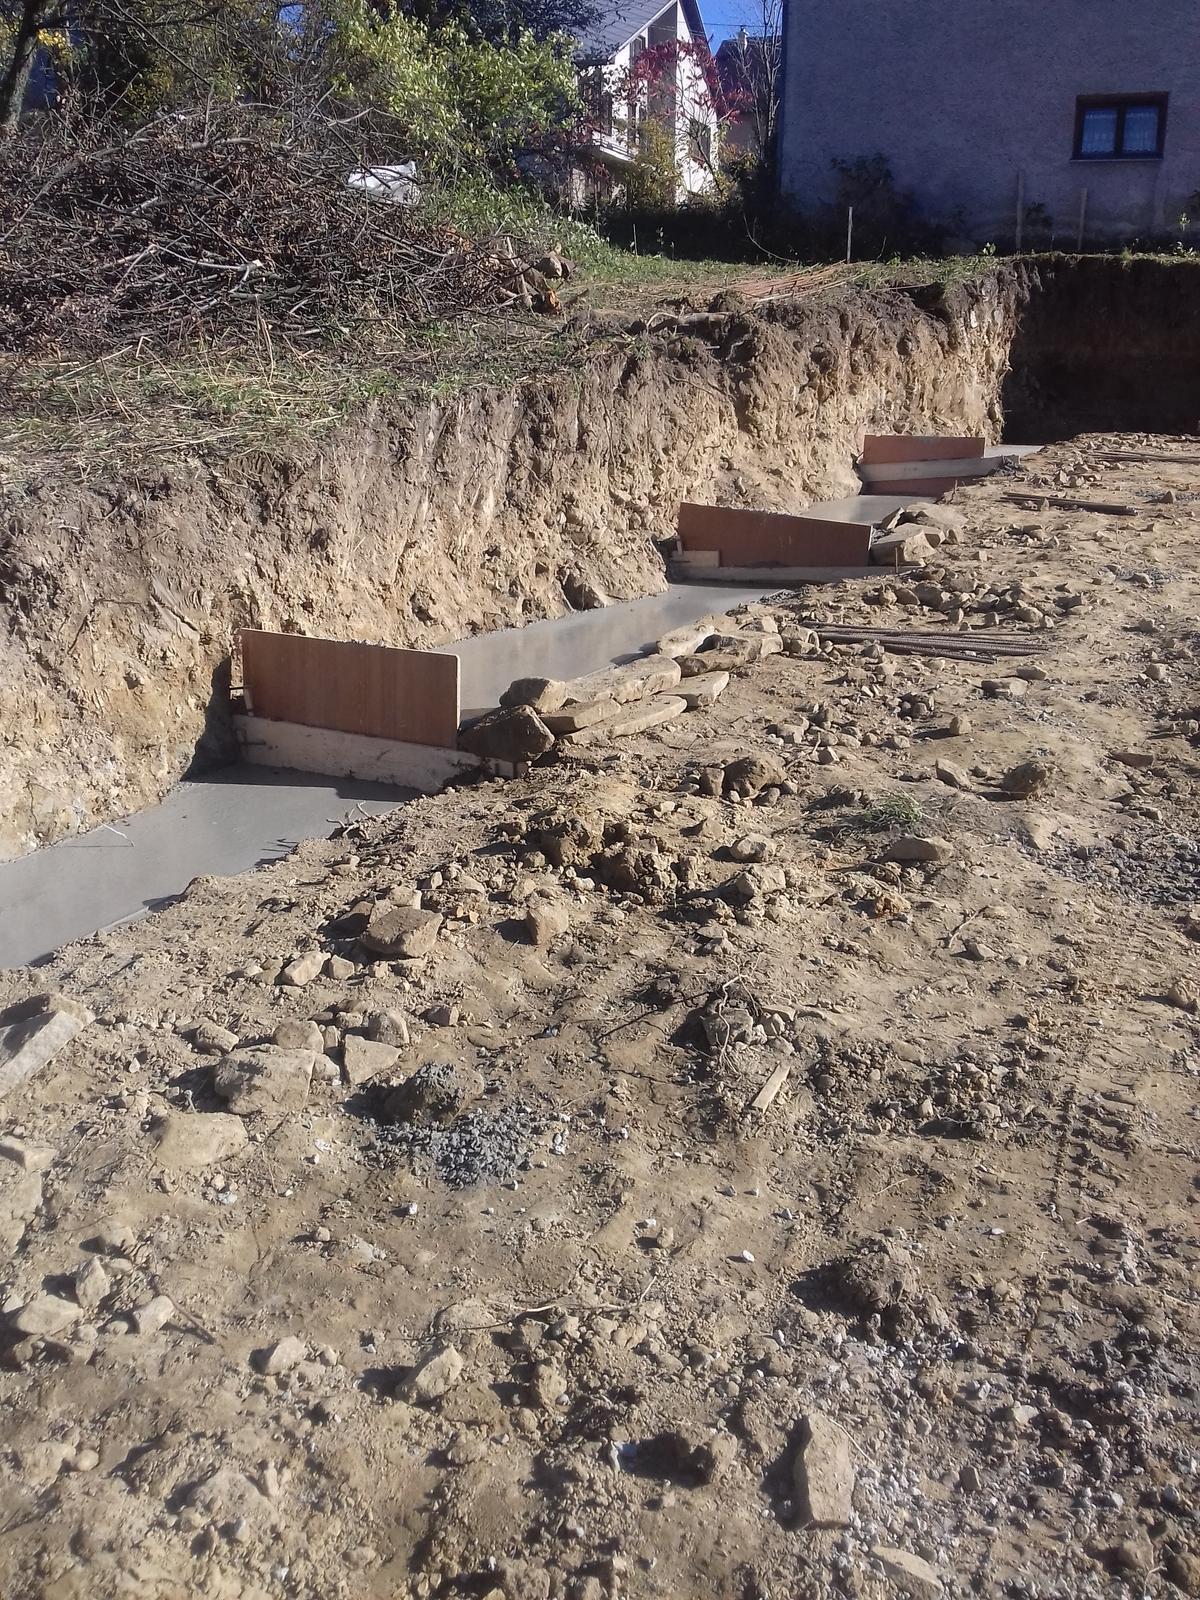 Najprv oporny mur a potom dom... - zaliate zaklady 27 m3 betonu